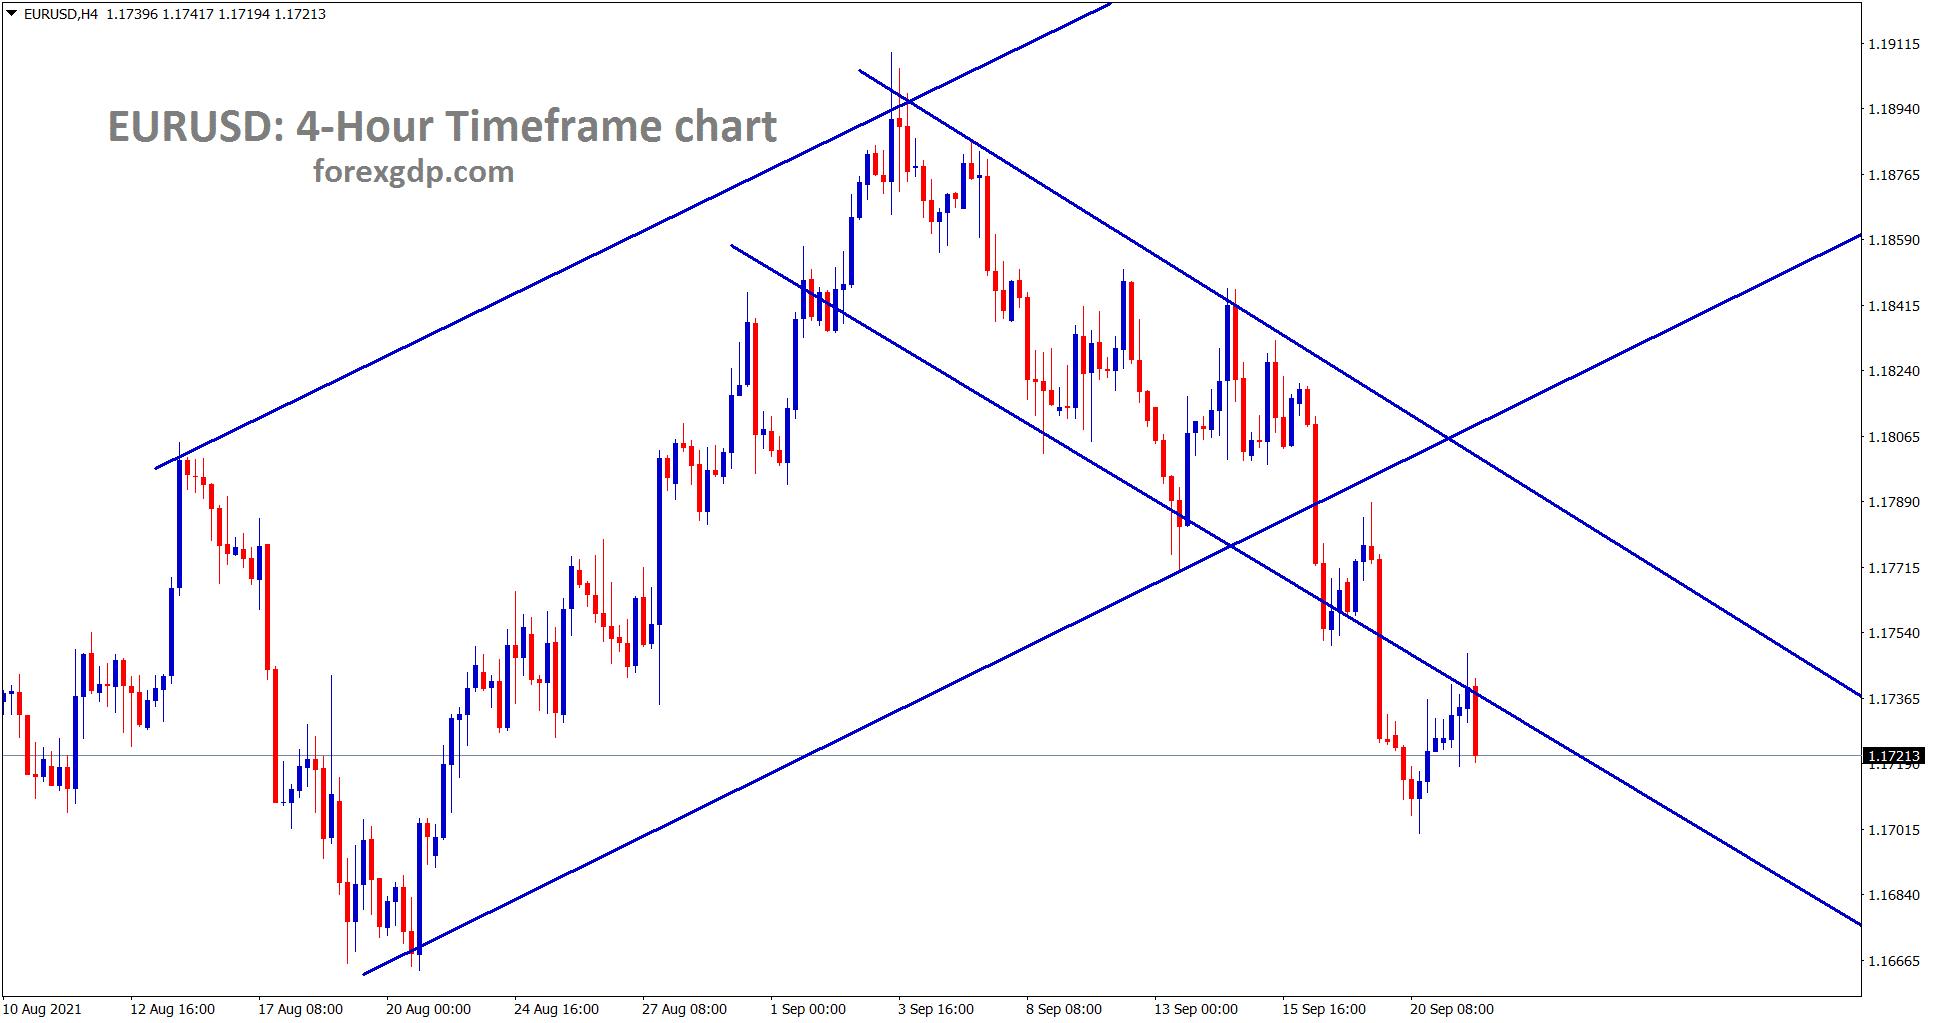 EURUSD is falling after retesting the broken descending channel